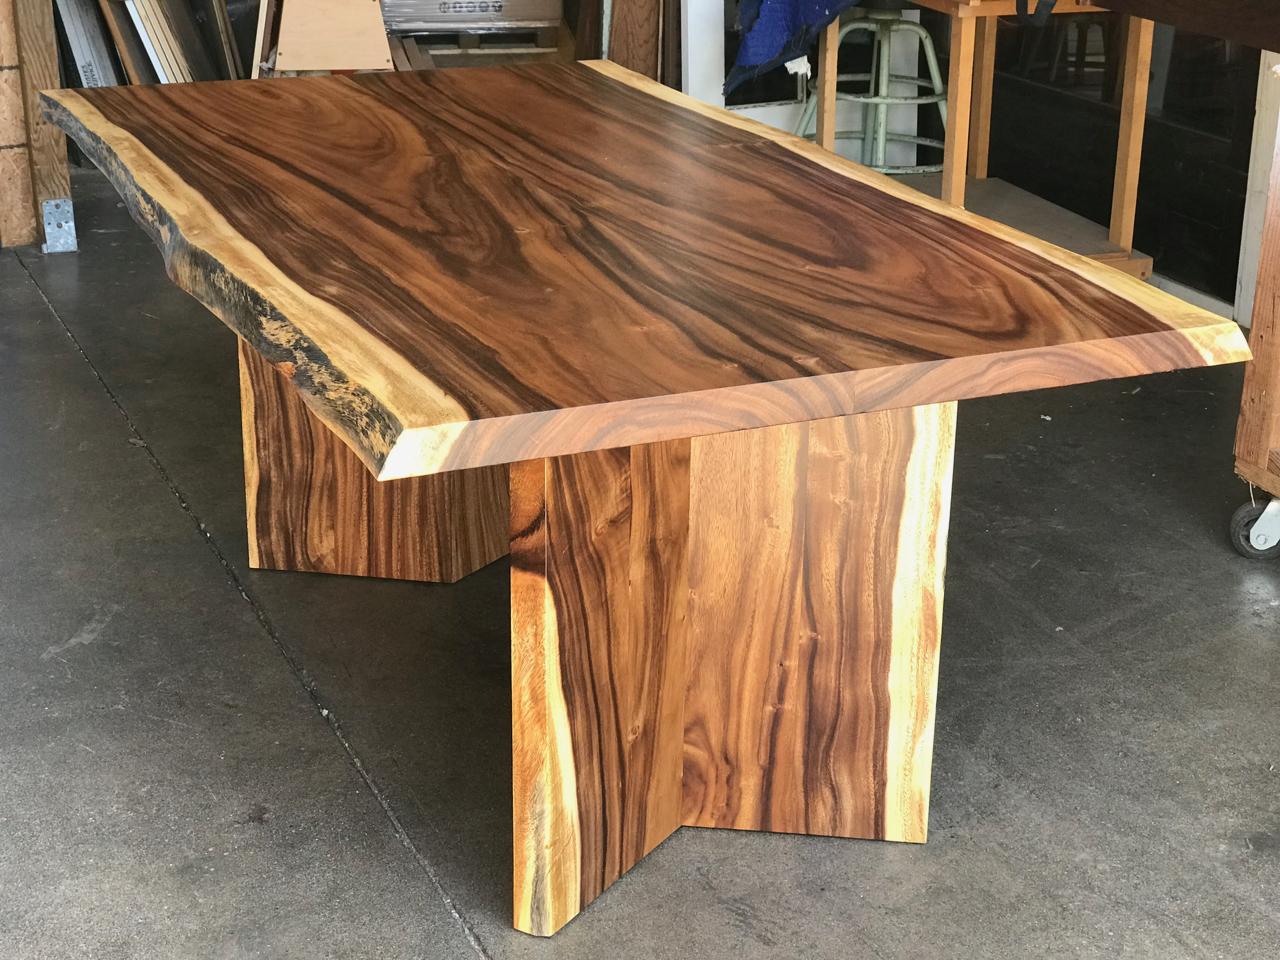 Honolulu Furniture Company custom furniture maker logo